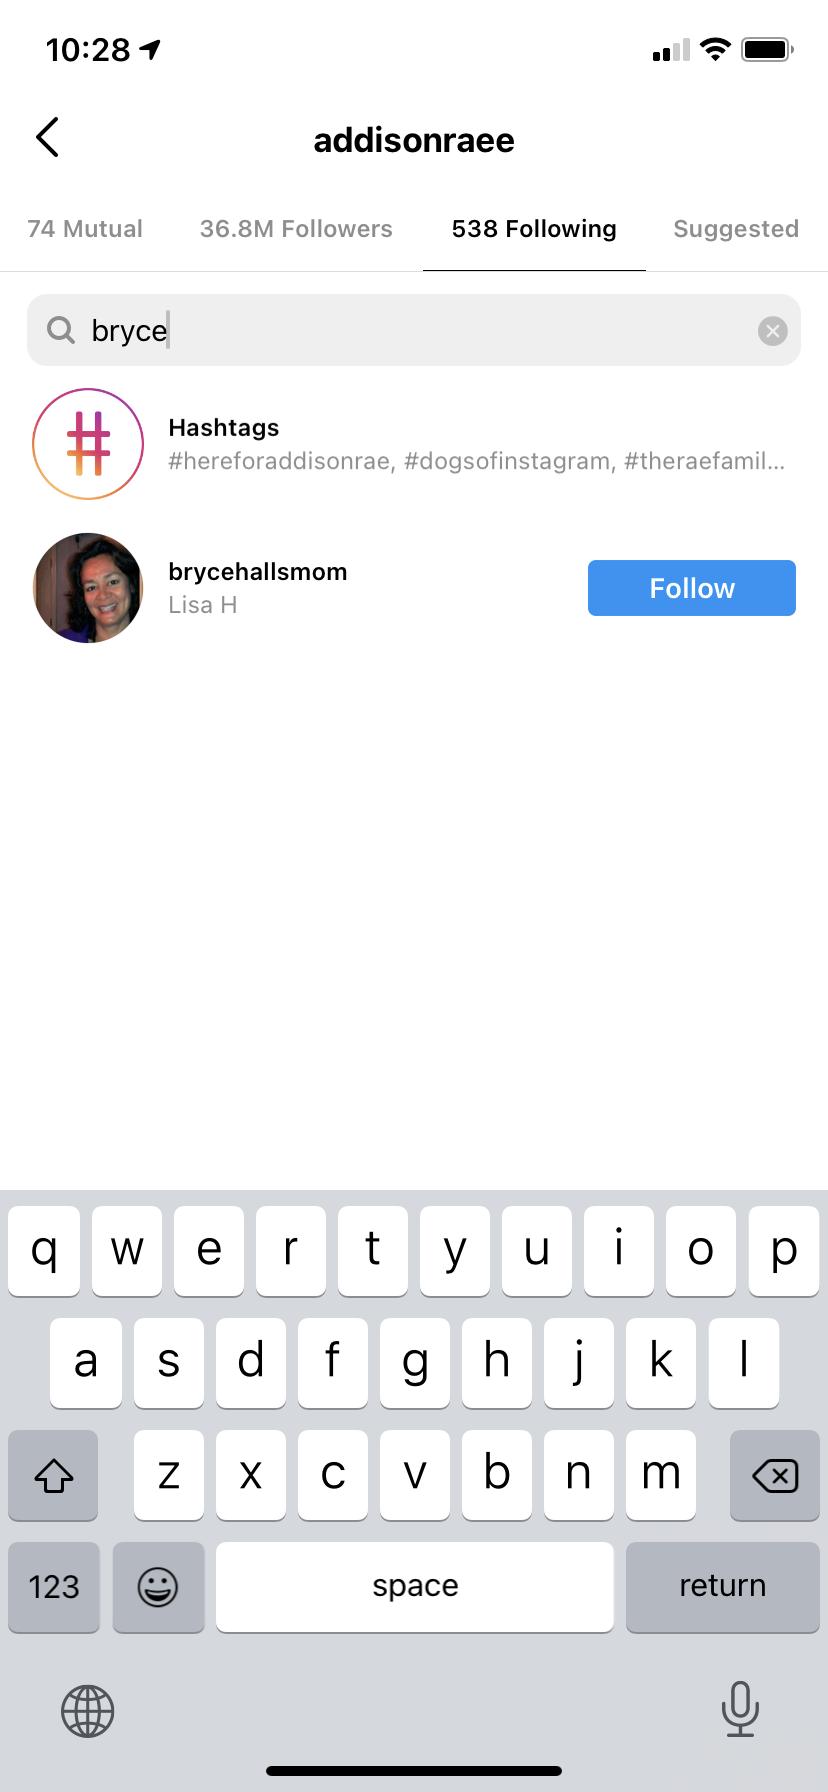 [ACTUALIZACIÓN]  Addison Rae and Bryce Hall have officially broken up